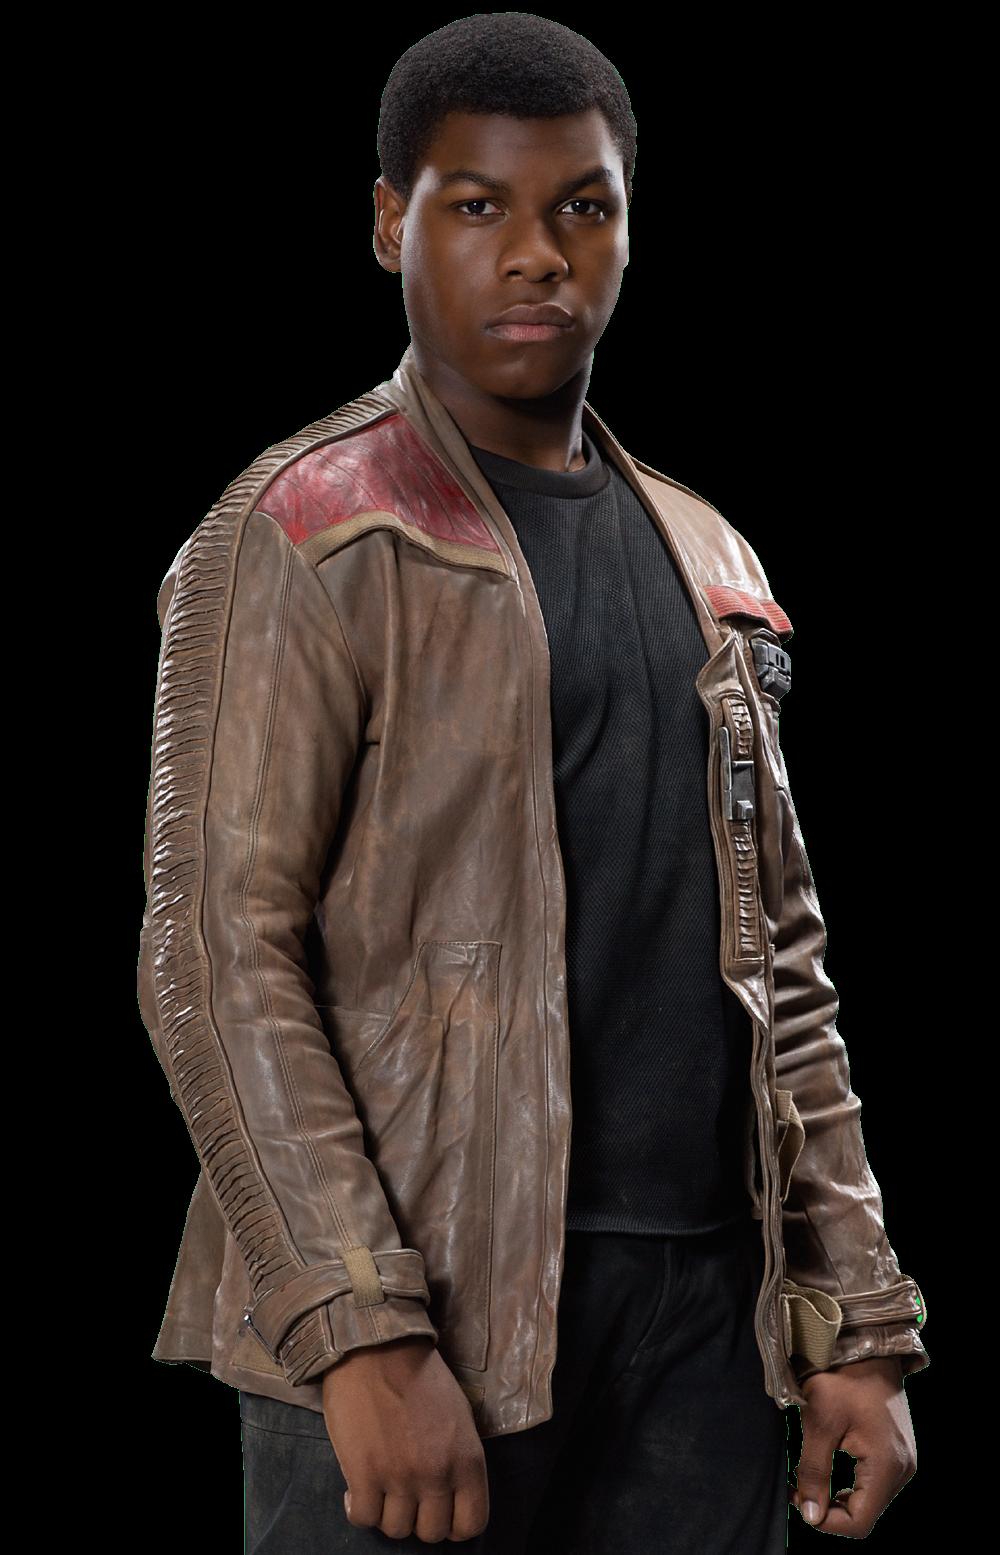 f64ded18cc6c2 Resistance fighter jacket